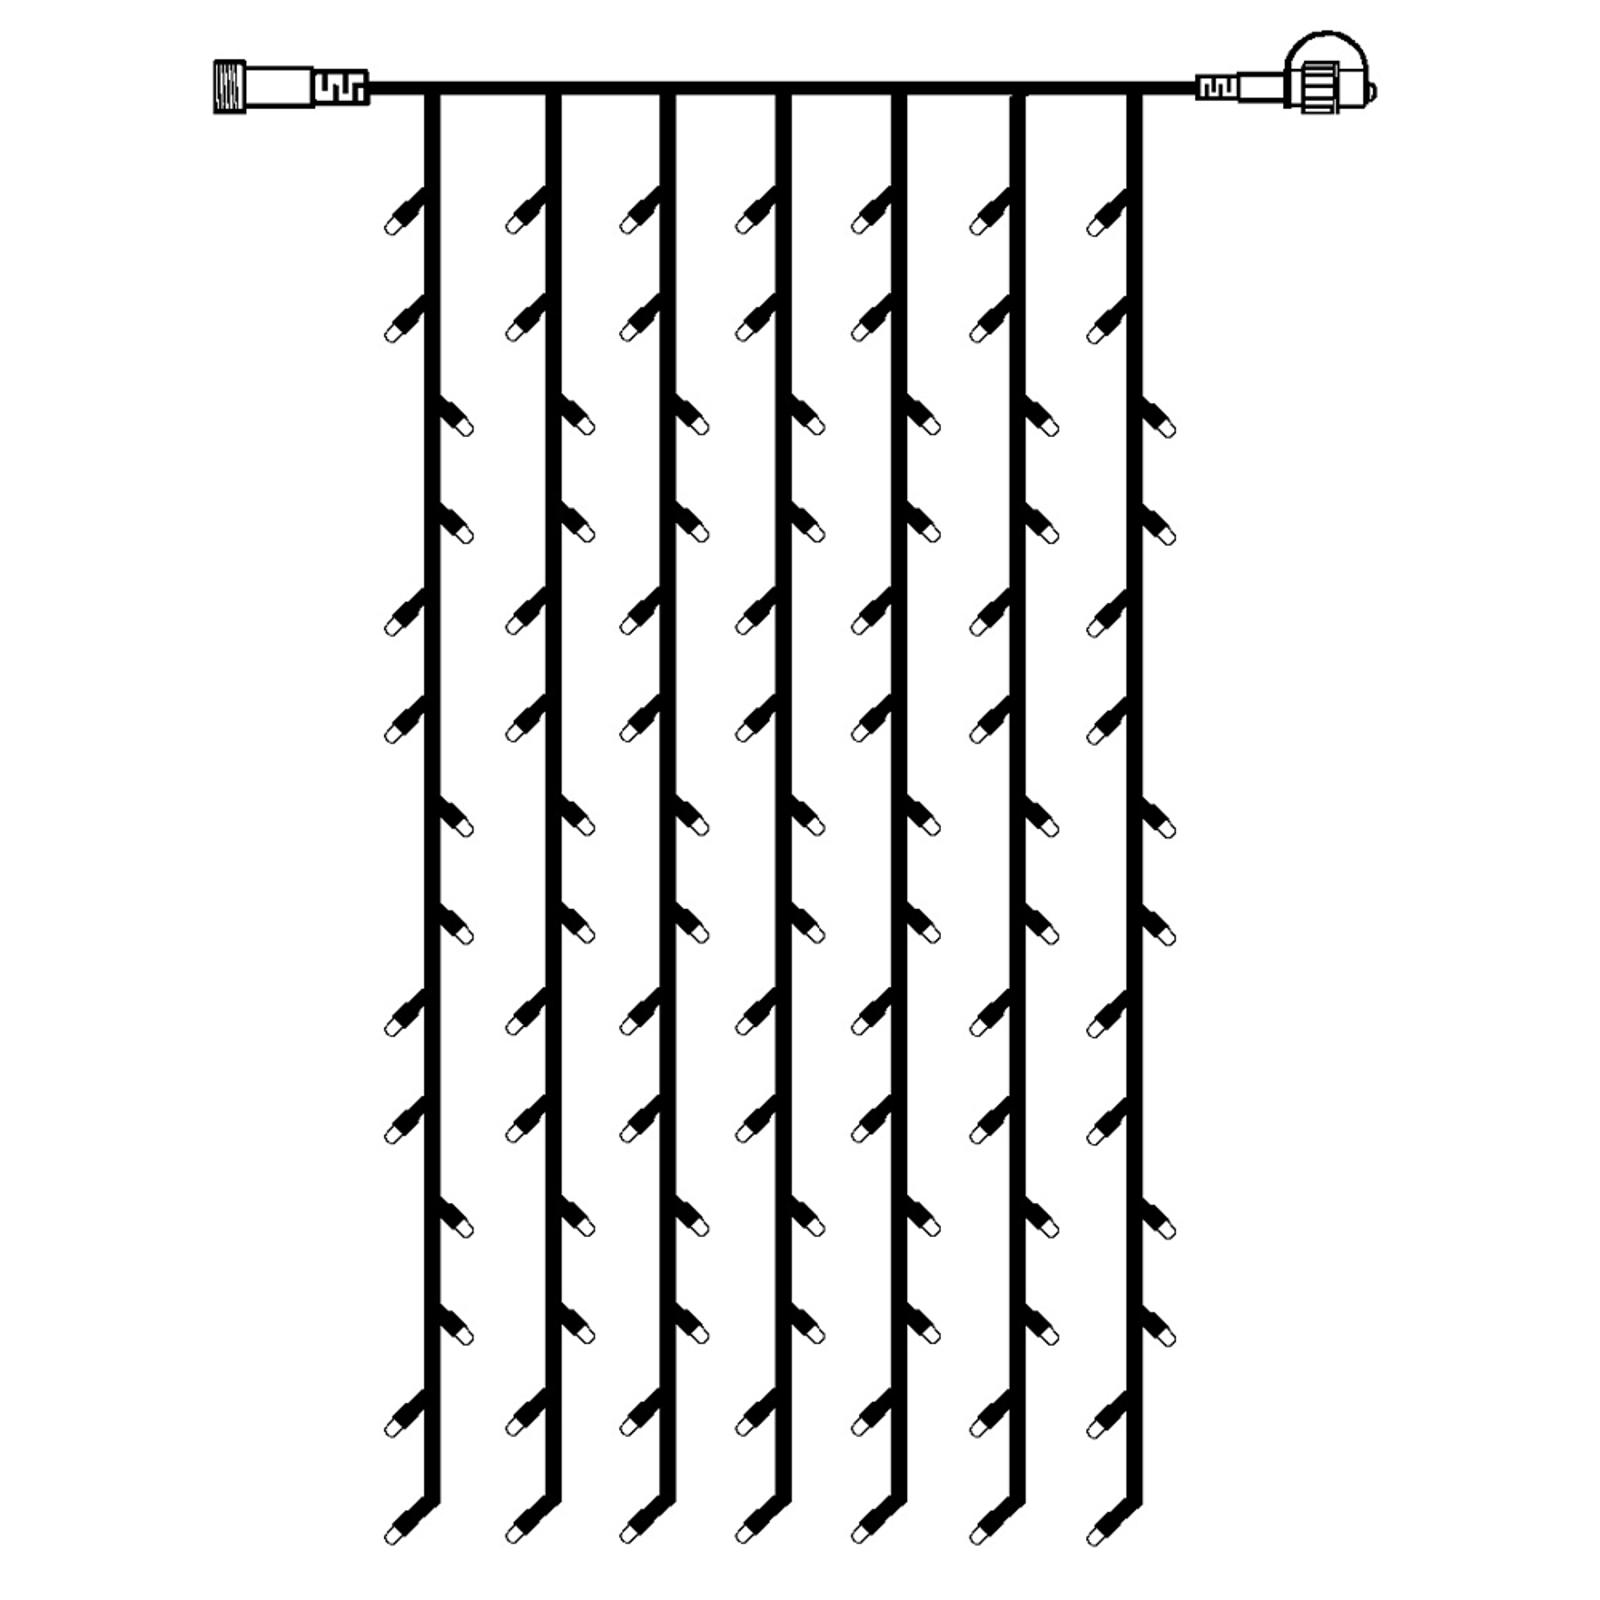 Uitbreidingsketting led-lichtgordijn System 24